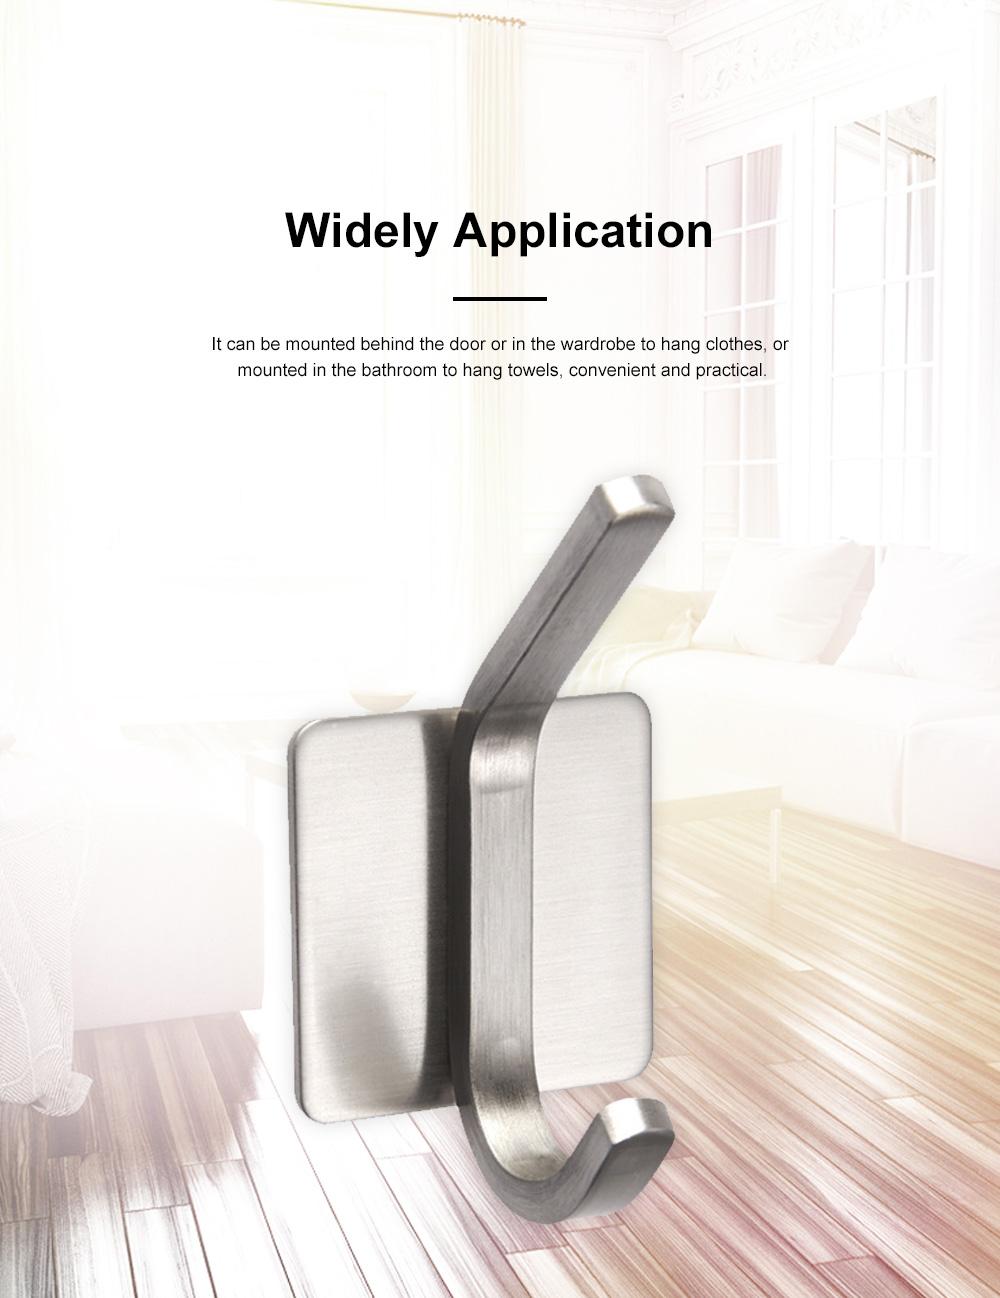 3M Glue Long Tail Hooks for Kitchen Bathroom Bedroom Hanging Waterproof 304 Stainless Steel Wall Hooks 2